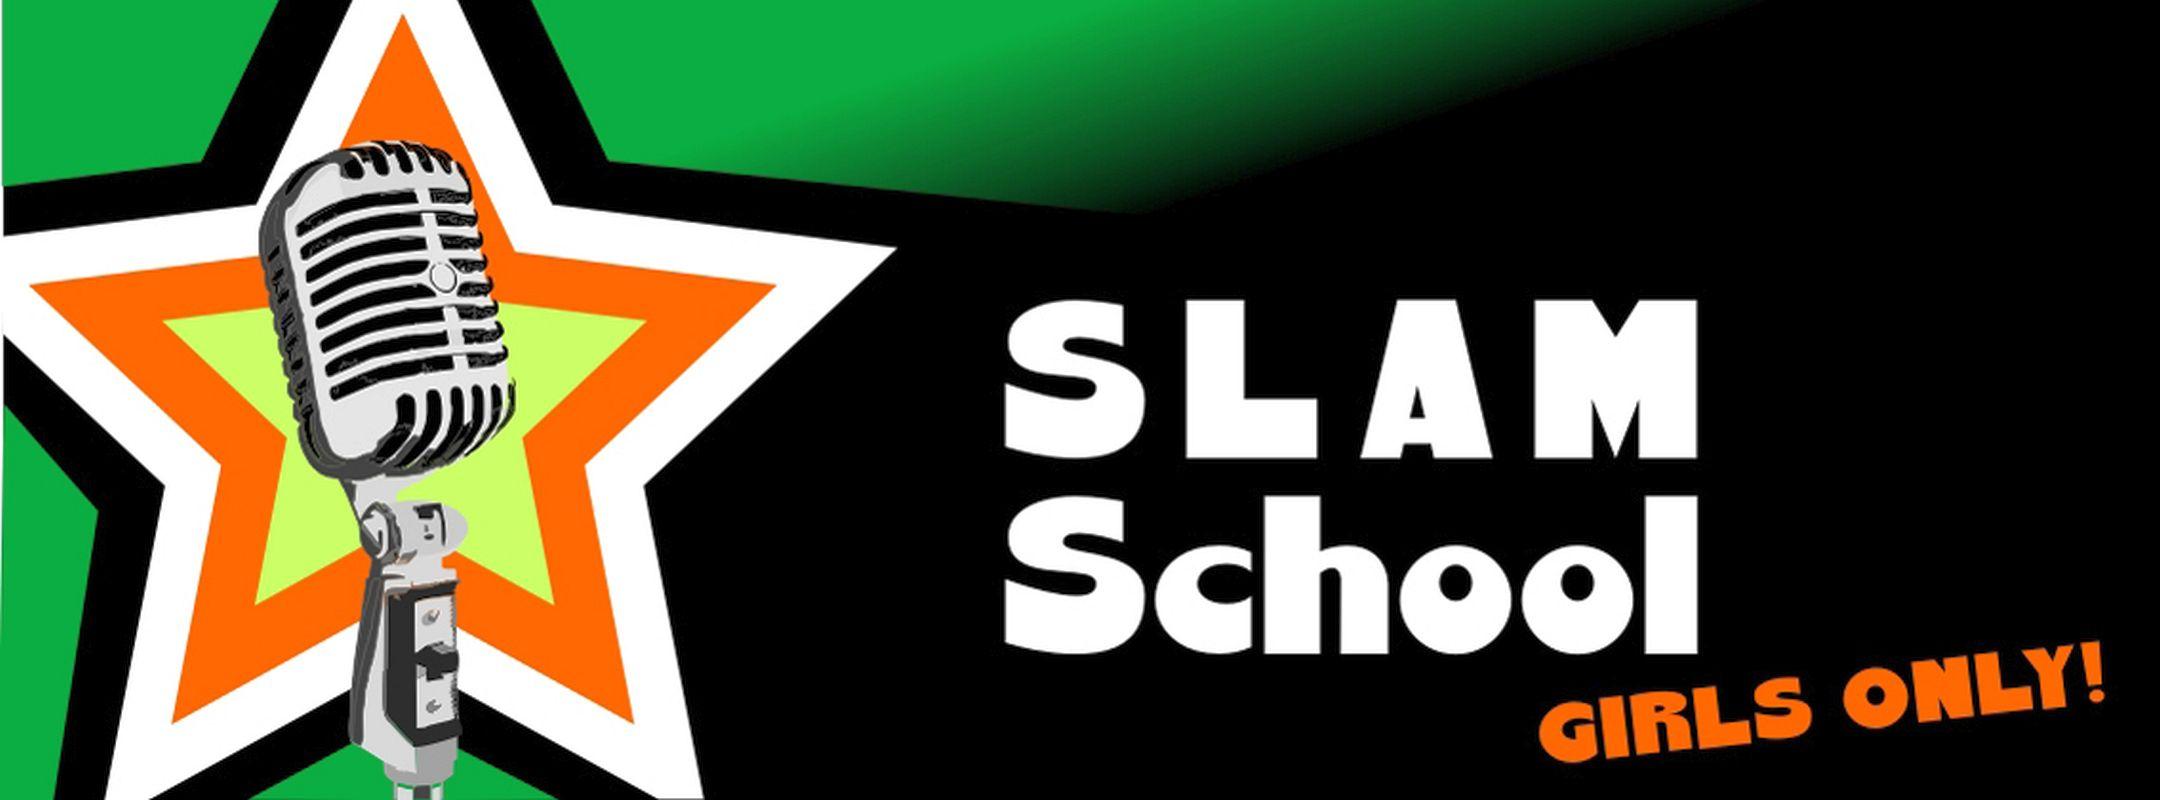 Slamschool